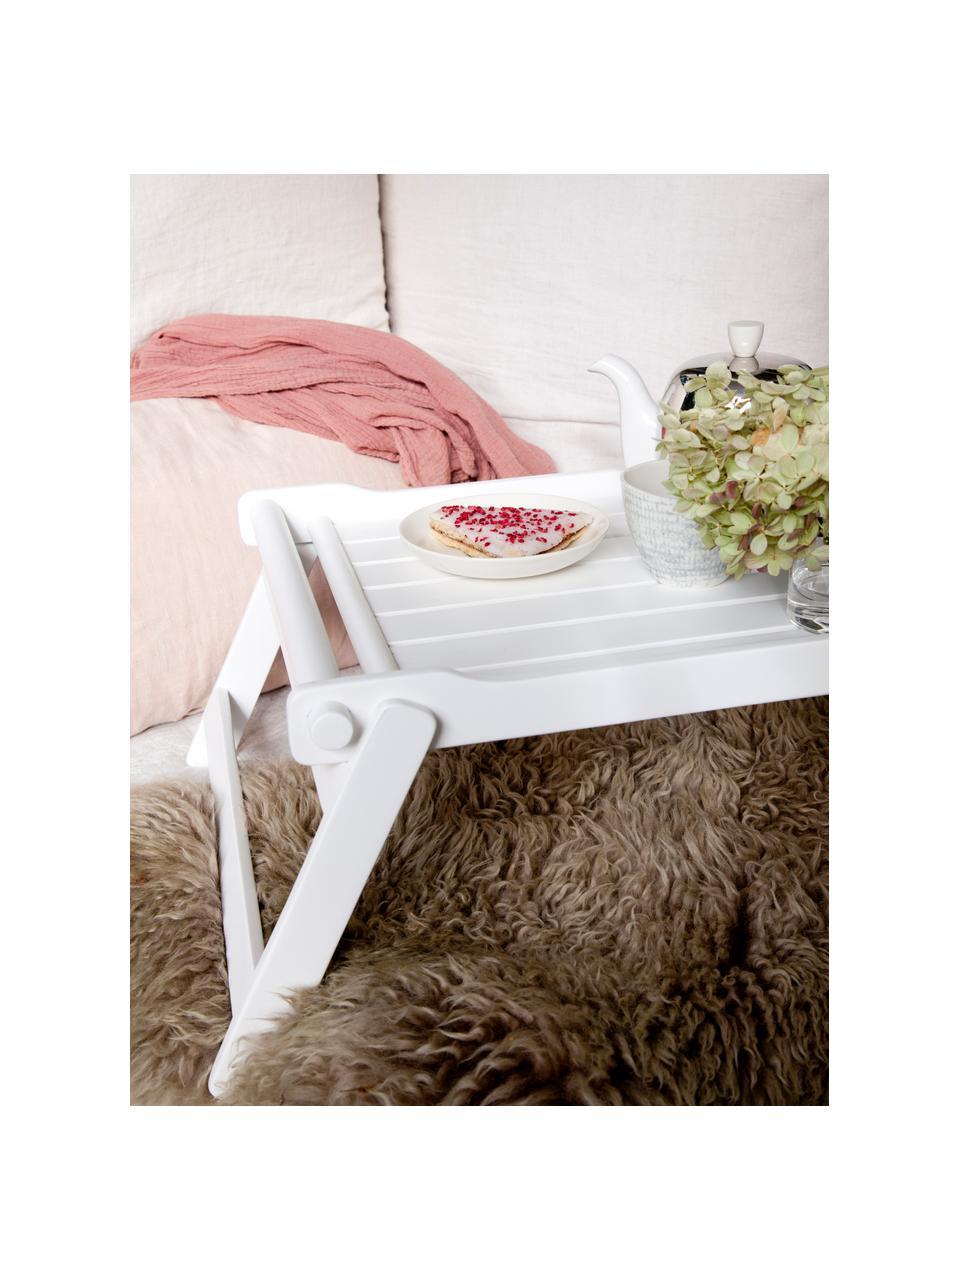 Klappbares Holz-Serviertablett Bed, L 58 x B 36 cm, Mahagoniholz, Polyurethan lackiert, Weiß , 36 x 58 cm